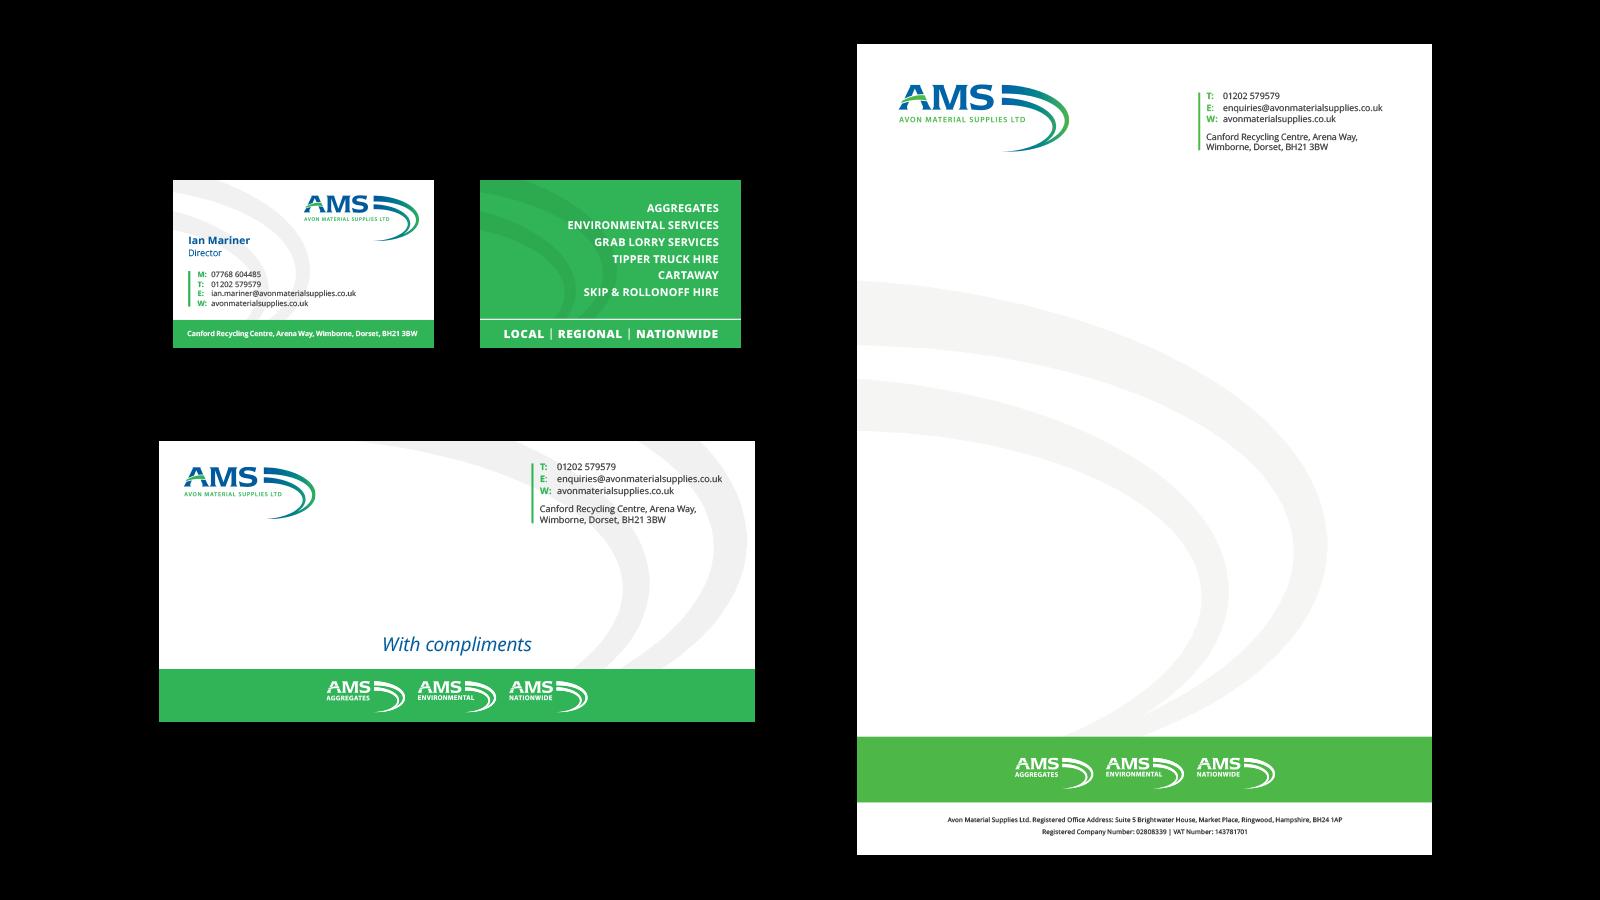 AMS stationary